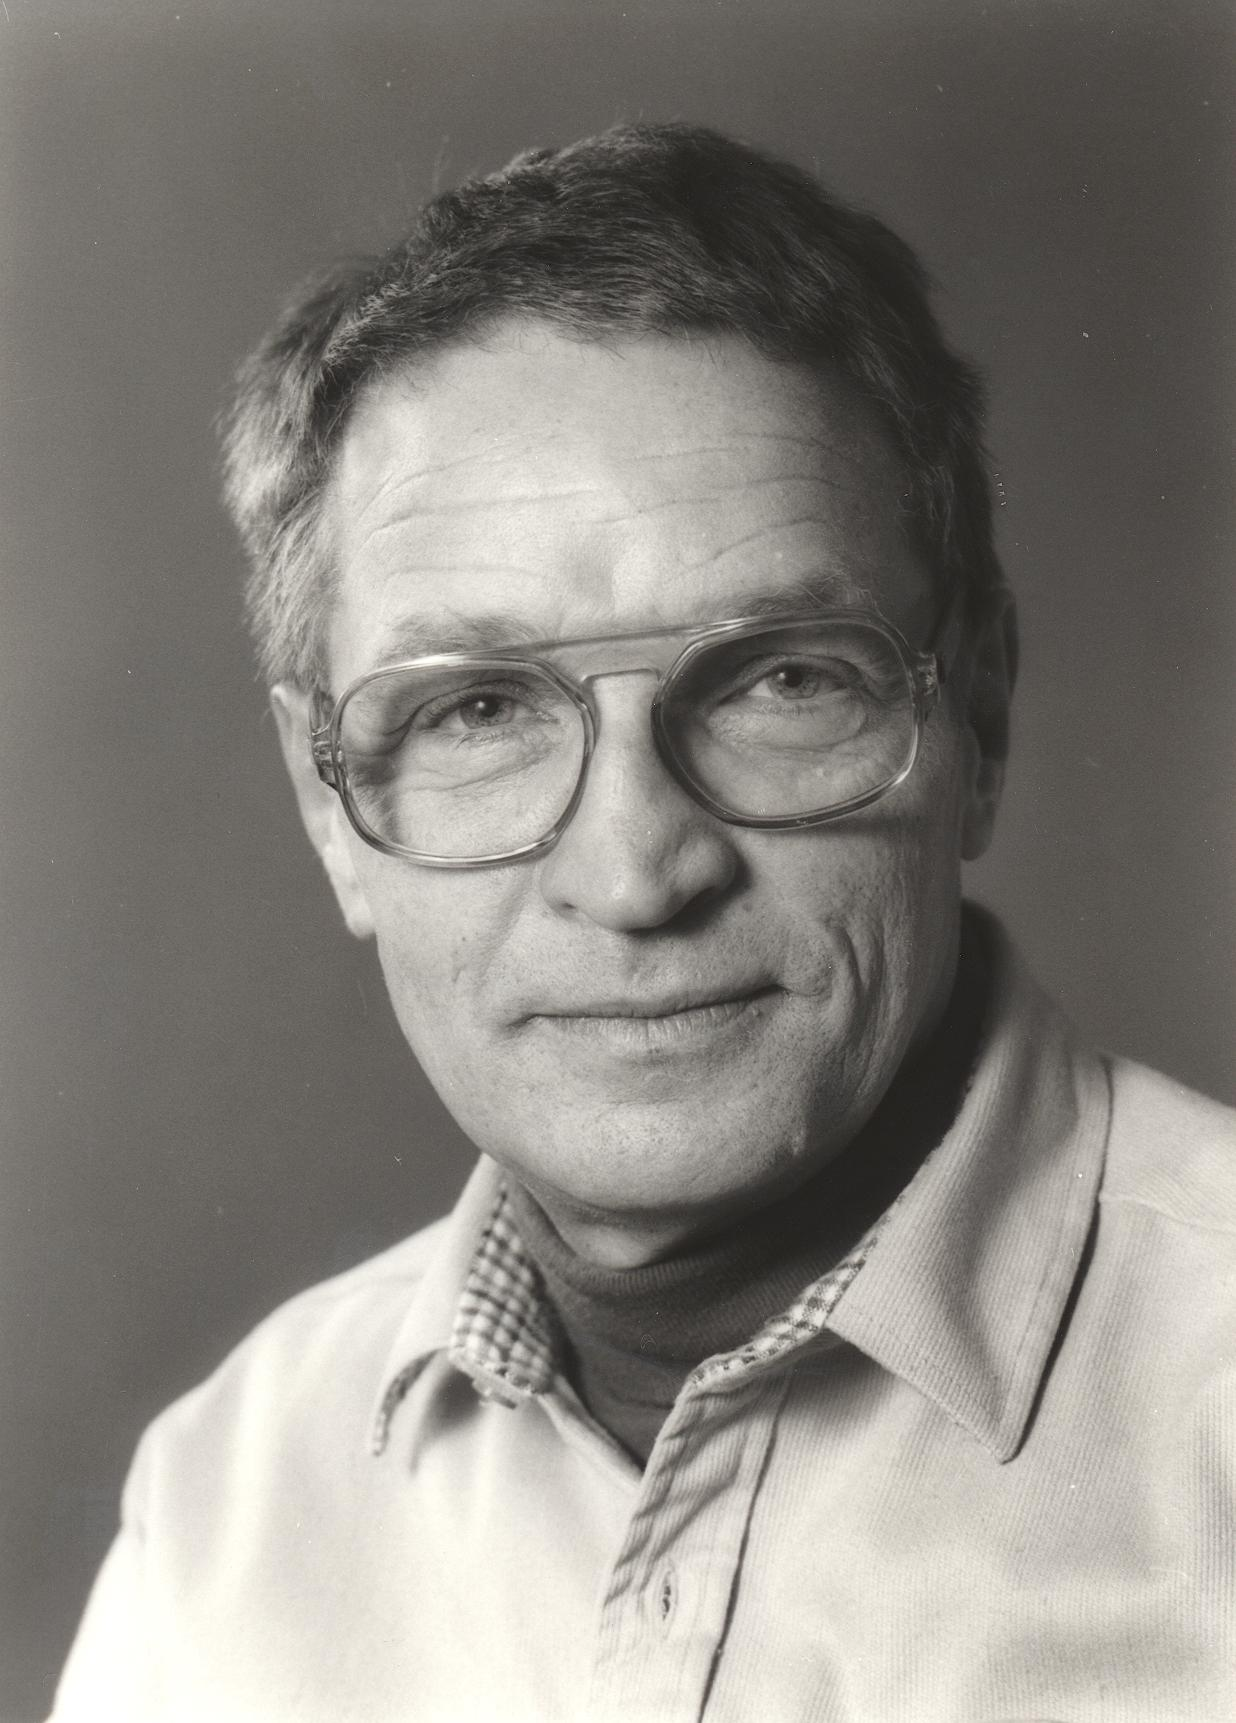 X. Imago Mundi-Kongress 1985, Innsbruck, Theo Ott, Filmproduzent